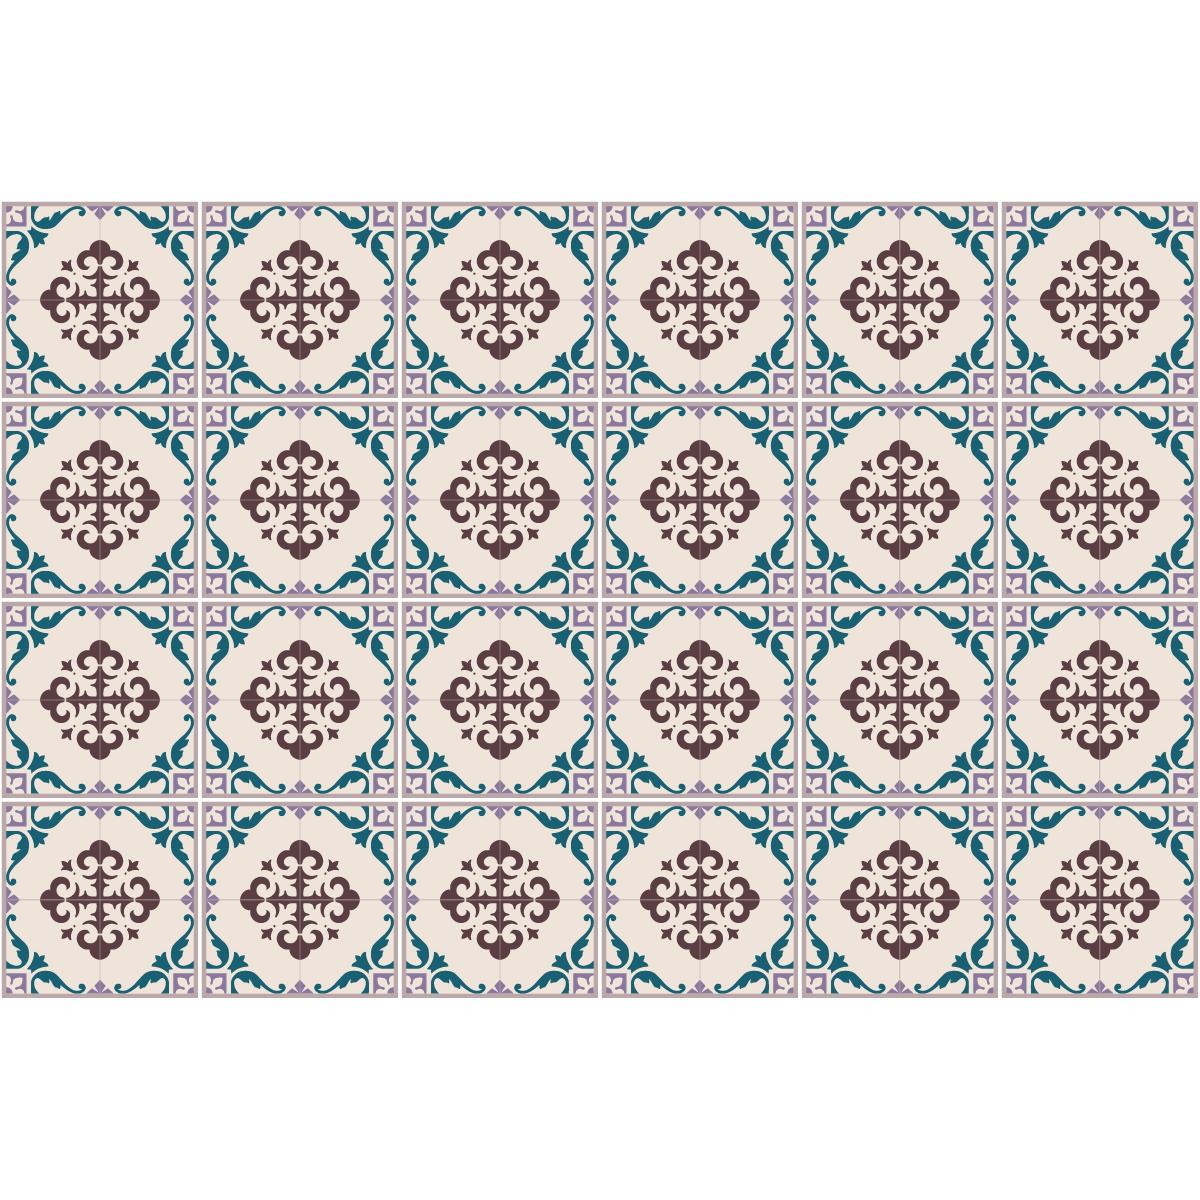 24 stickers carreaux de ciment azulejos antioco cuisine. Black Bedroom Furniture Sets. Home Design Ideas